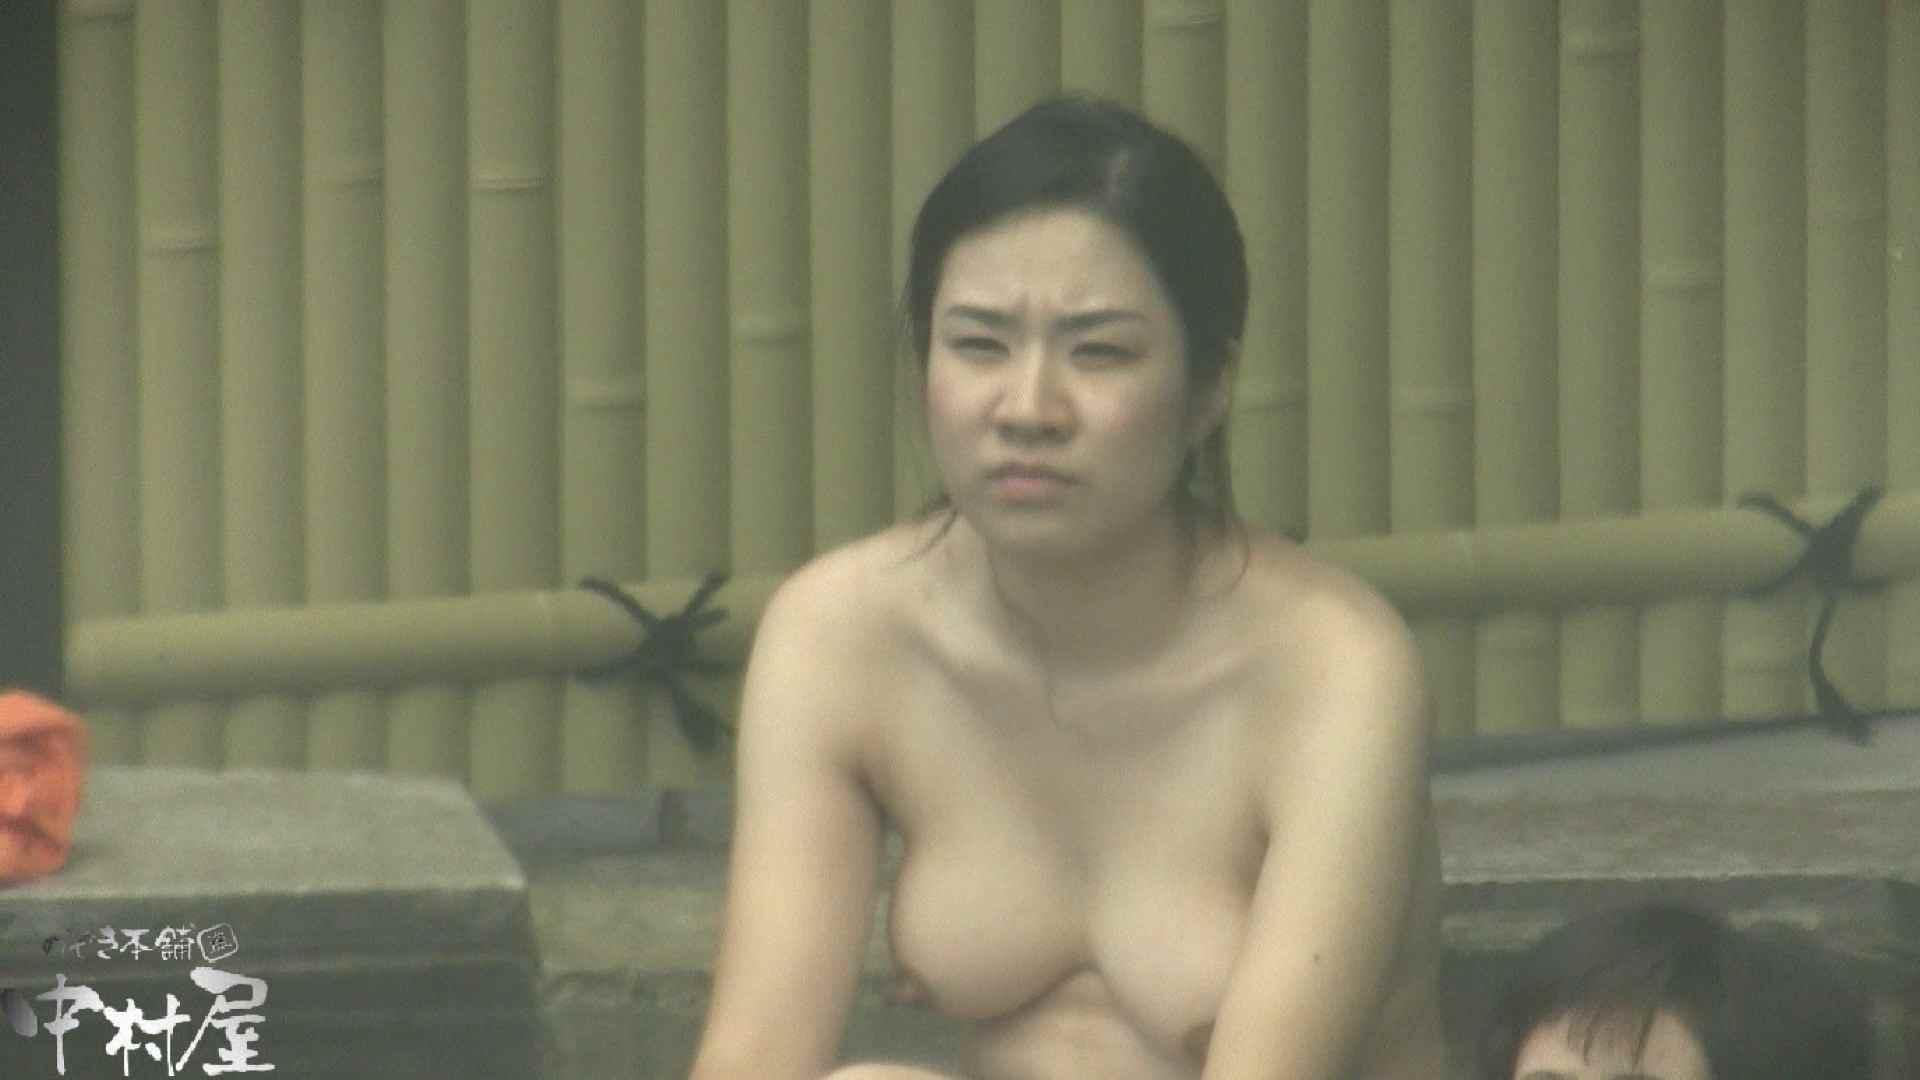 Aquaな露天風呂Vol.913 OLのエロ生活 すけべAV動画紹介 68連発 38